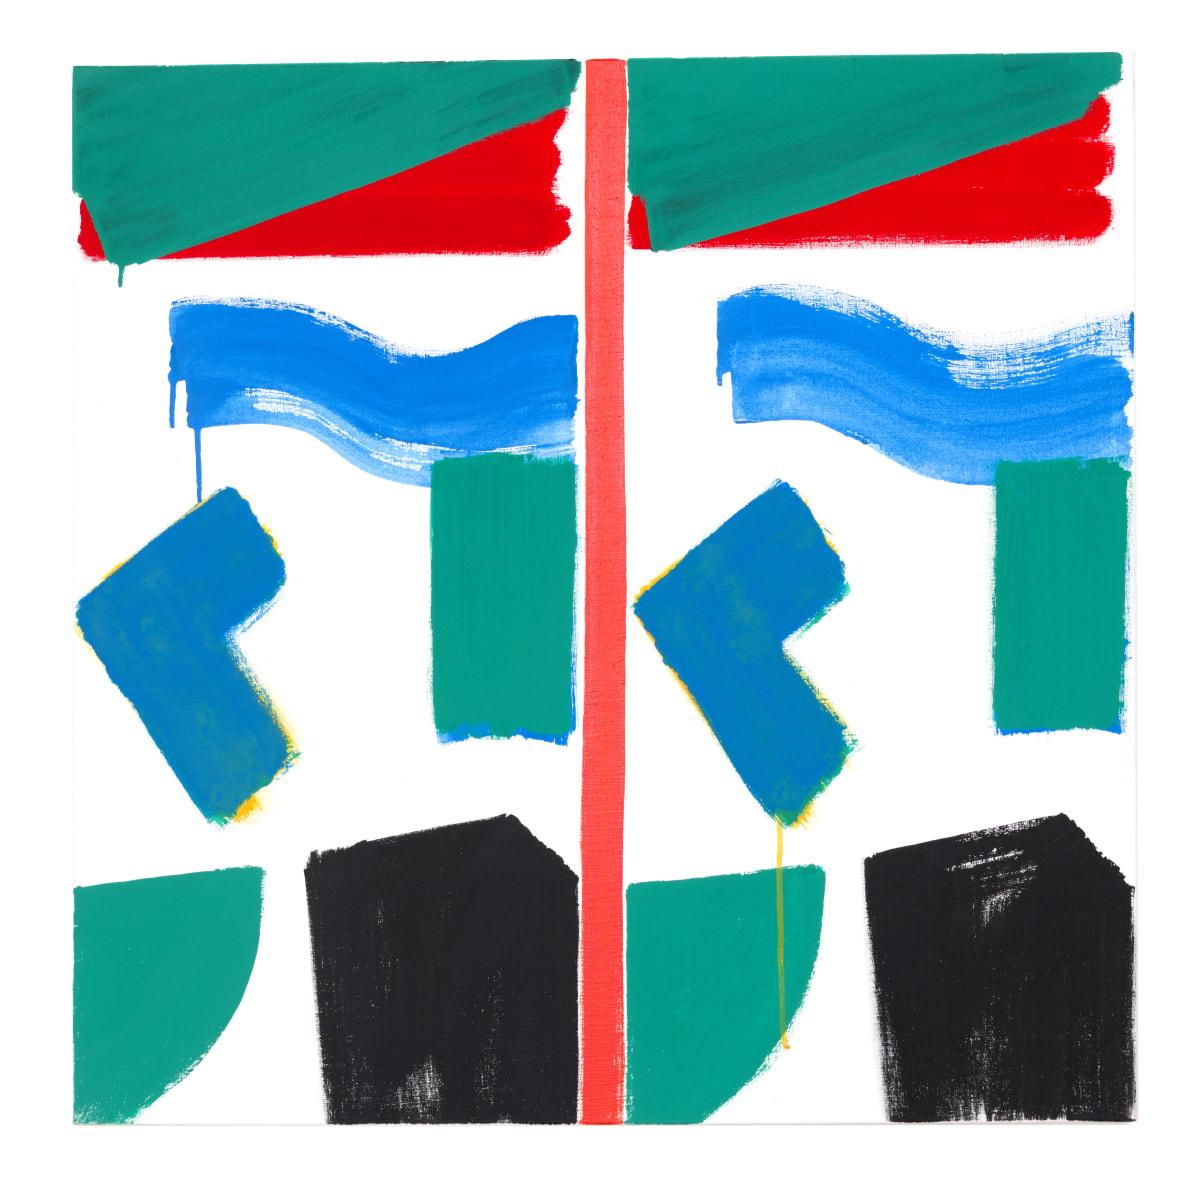 Bernard Piffaretti, Sans titre, 2017